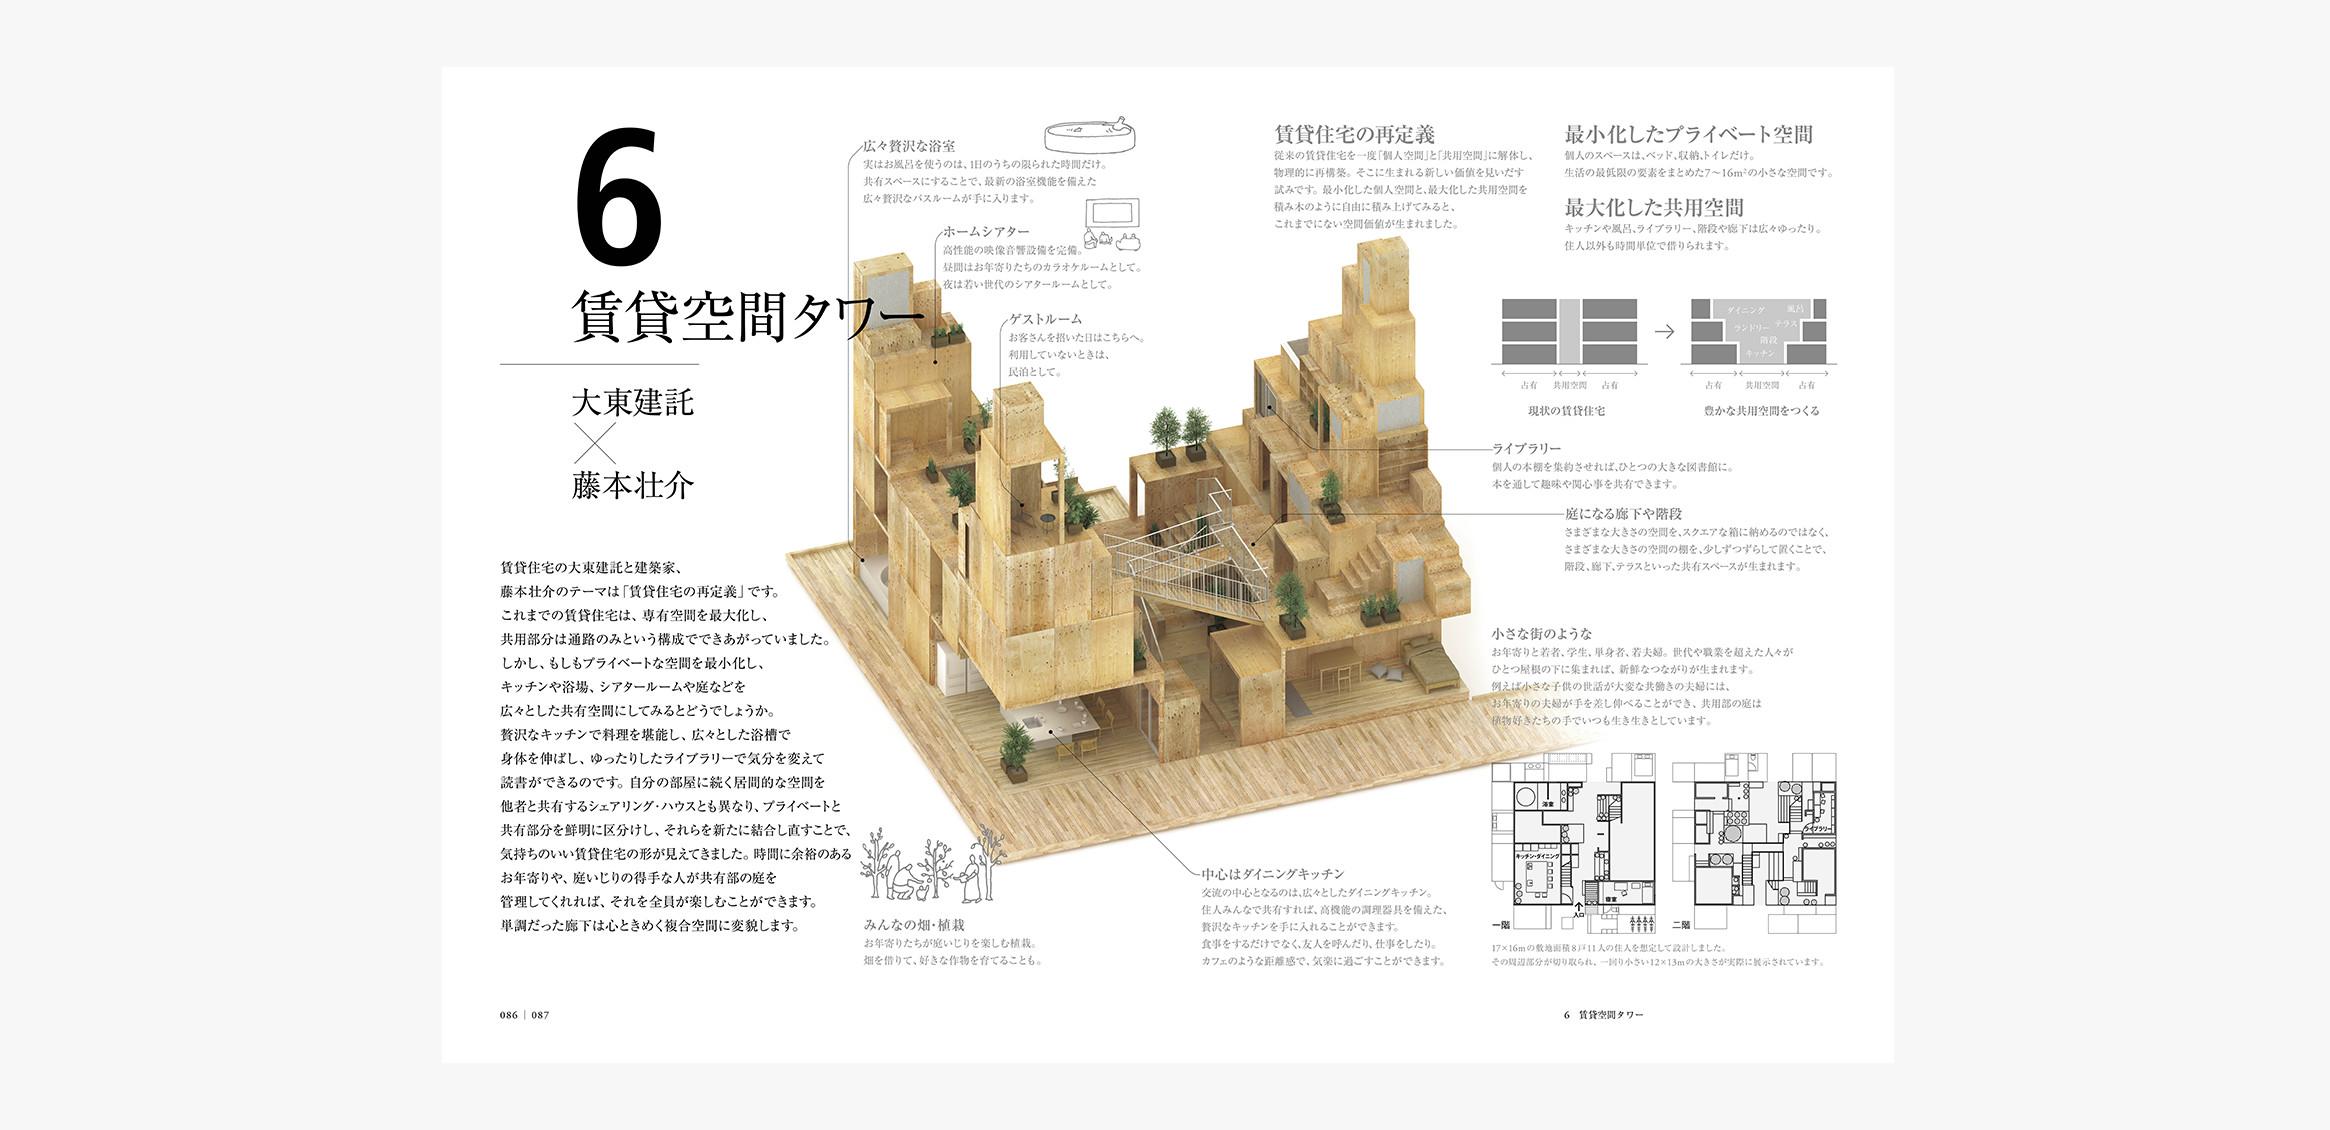 HOUSE VISION 2 2016 TOKYO EXHIBITION9枚目